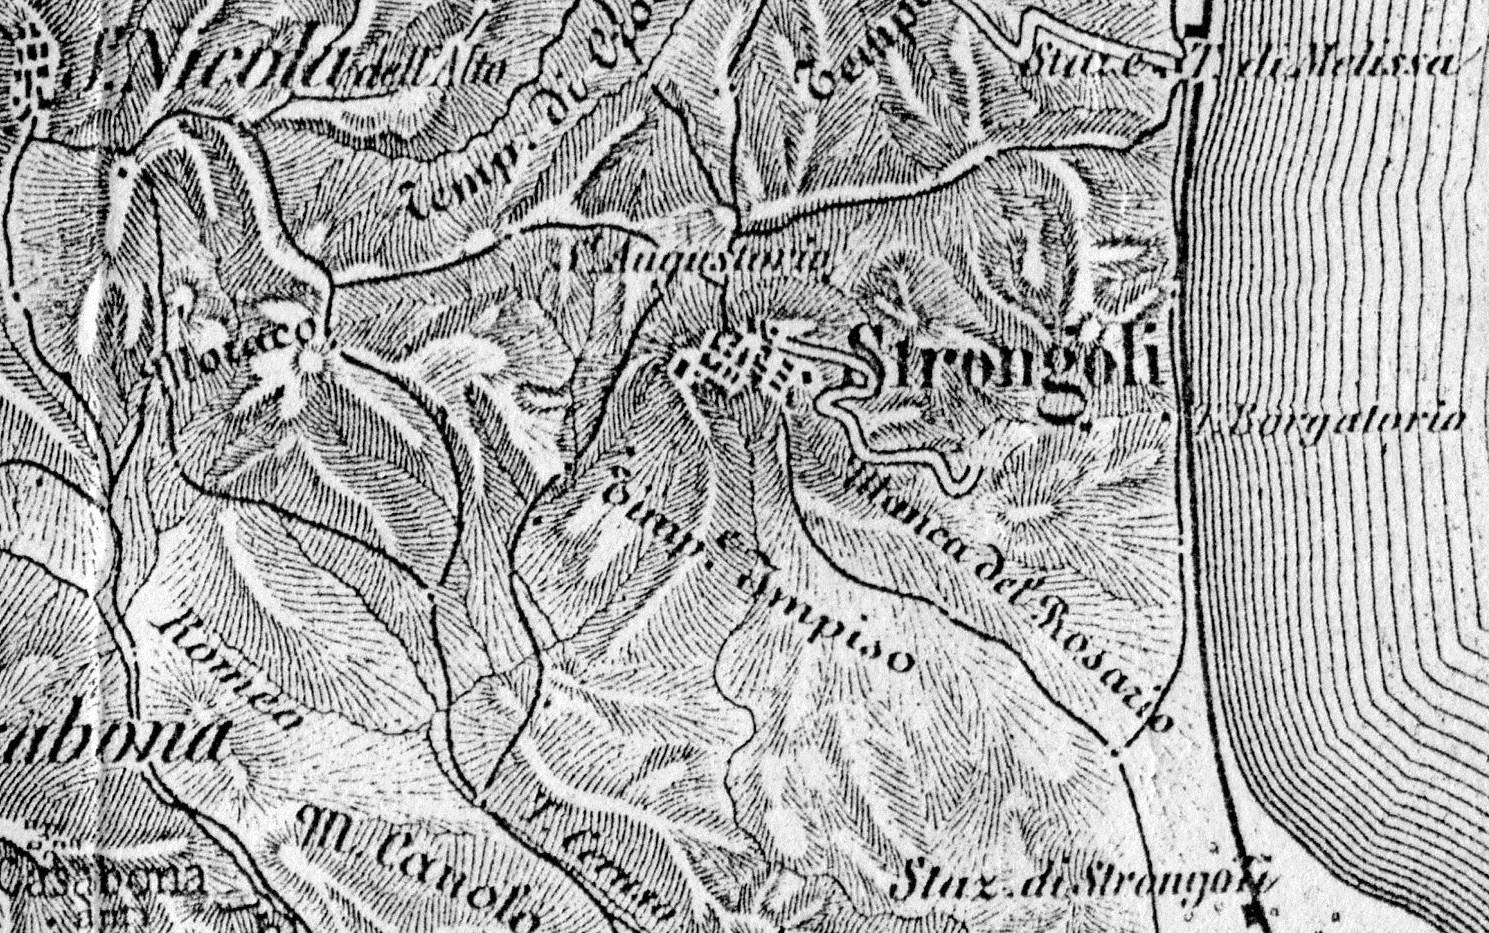 strongoli 1882